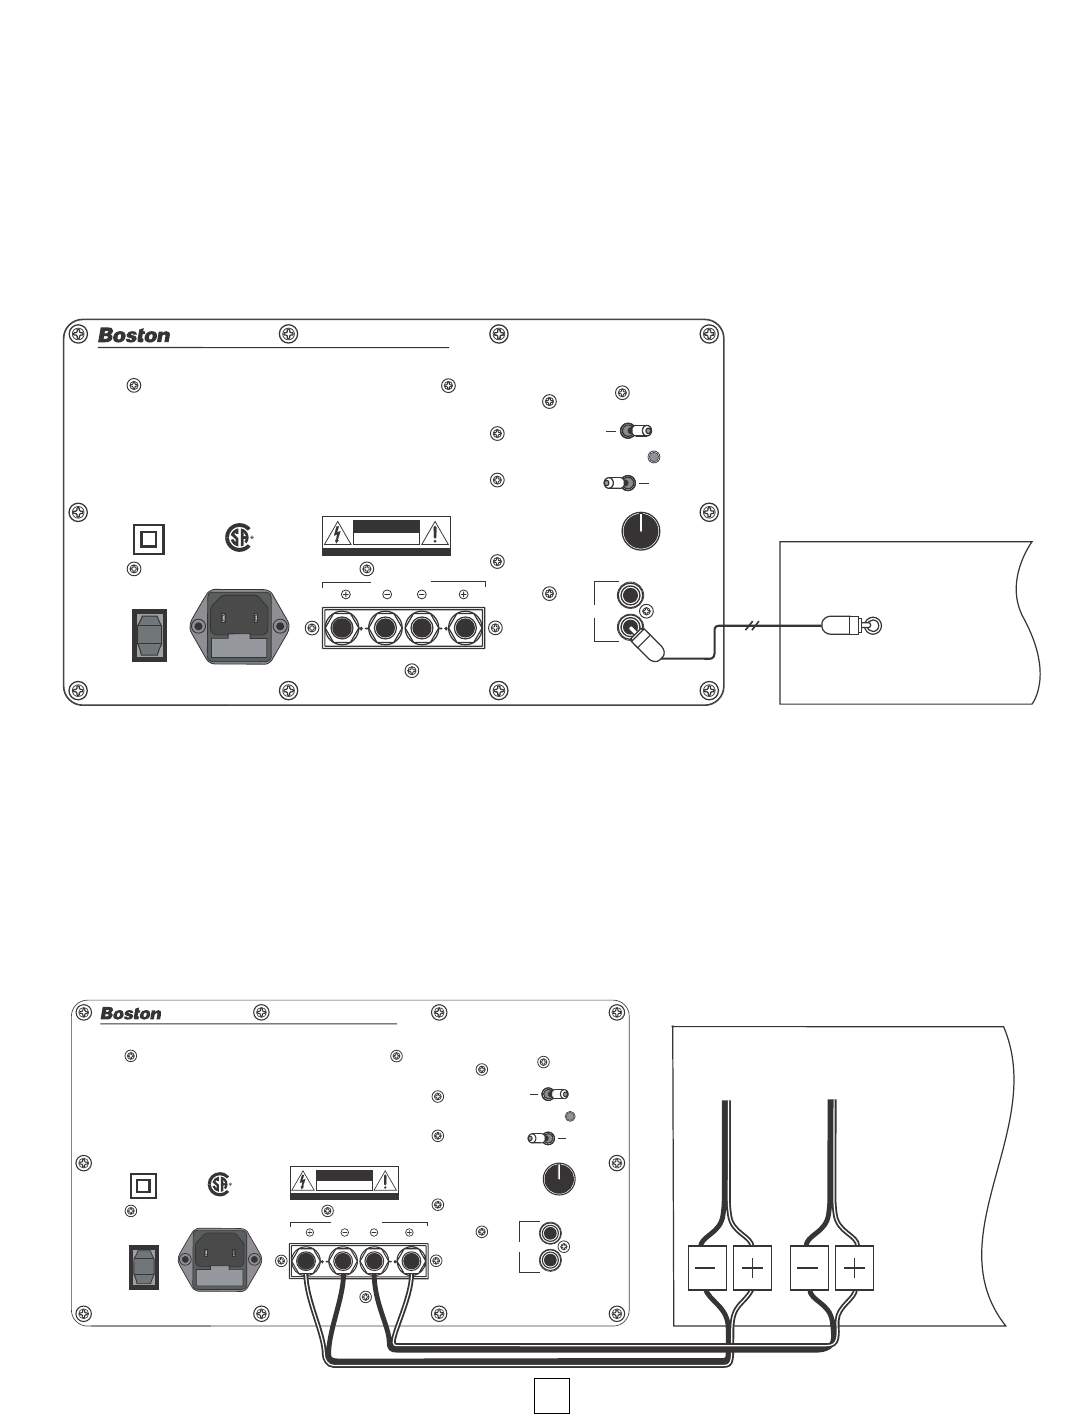 Boston Acoustics Subwoofer Wiring Diagram - Diagram Design Sources schematic-quest  - schematic-quest.paoloemartina.itdiagram database - paoloemartina.it